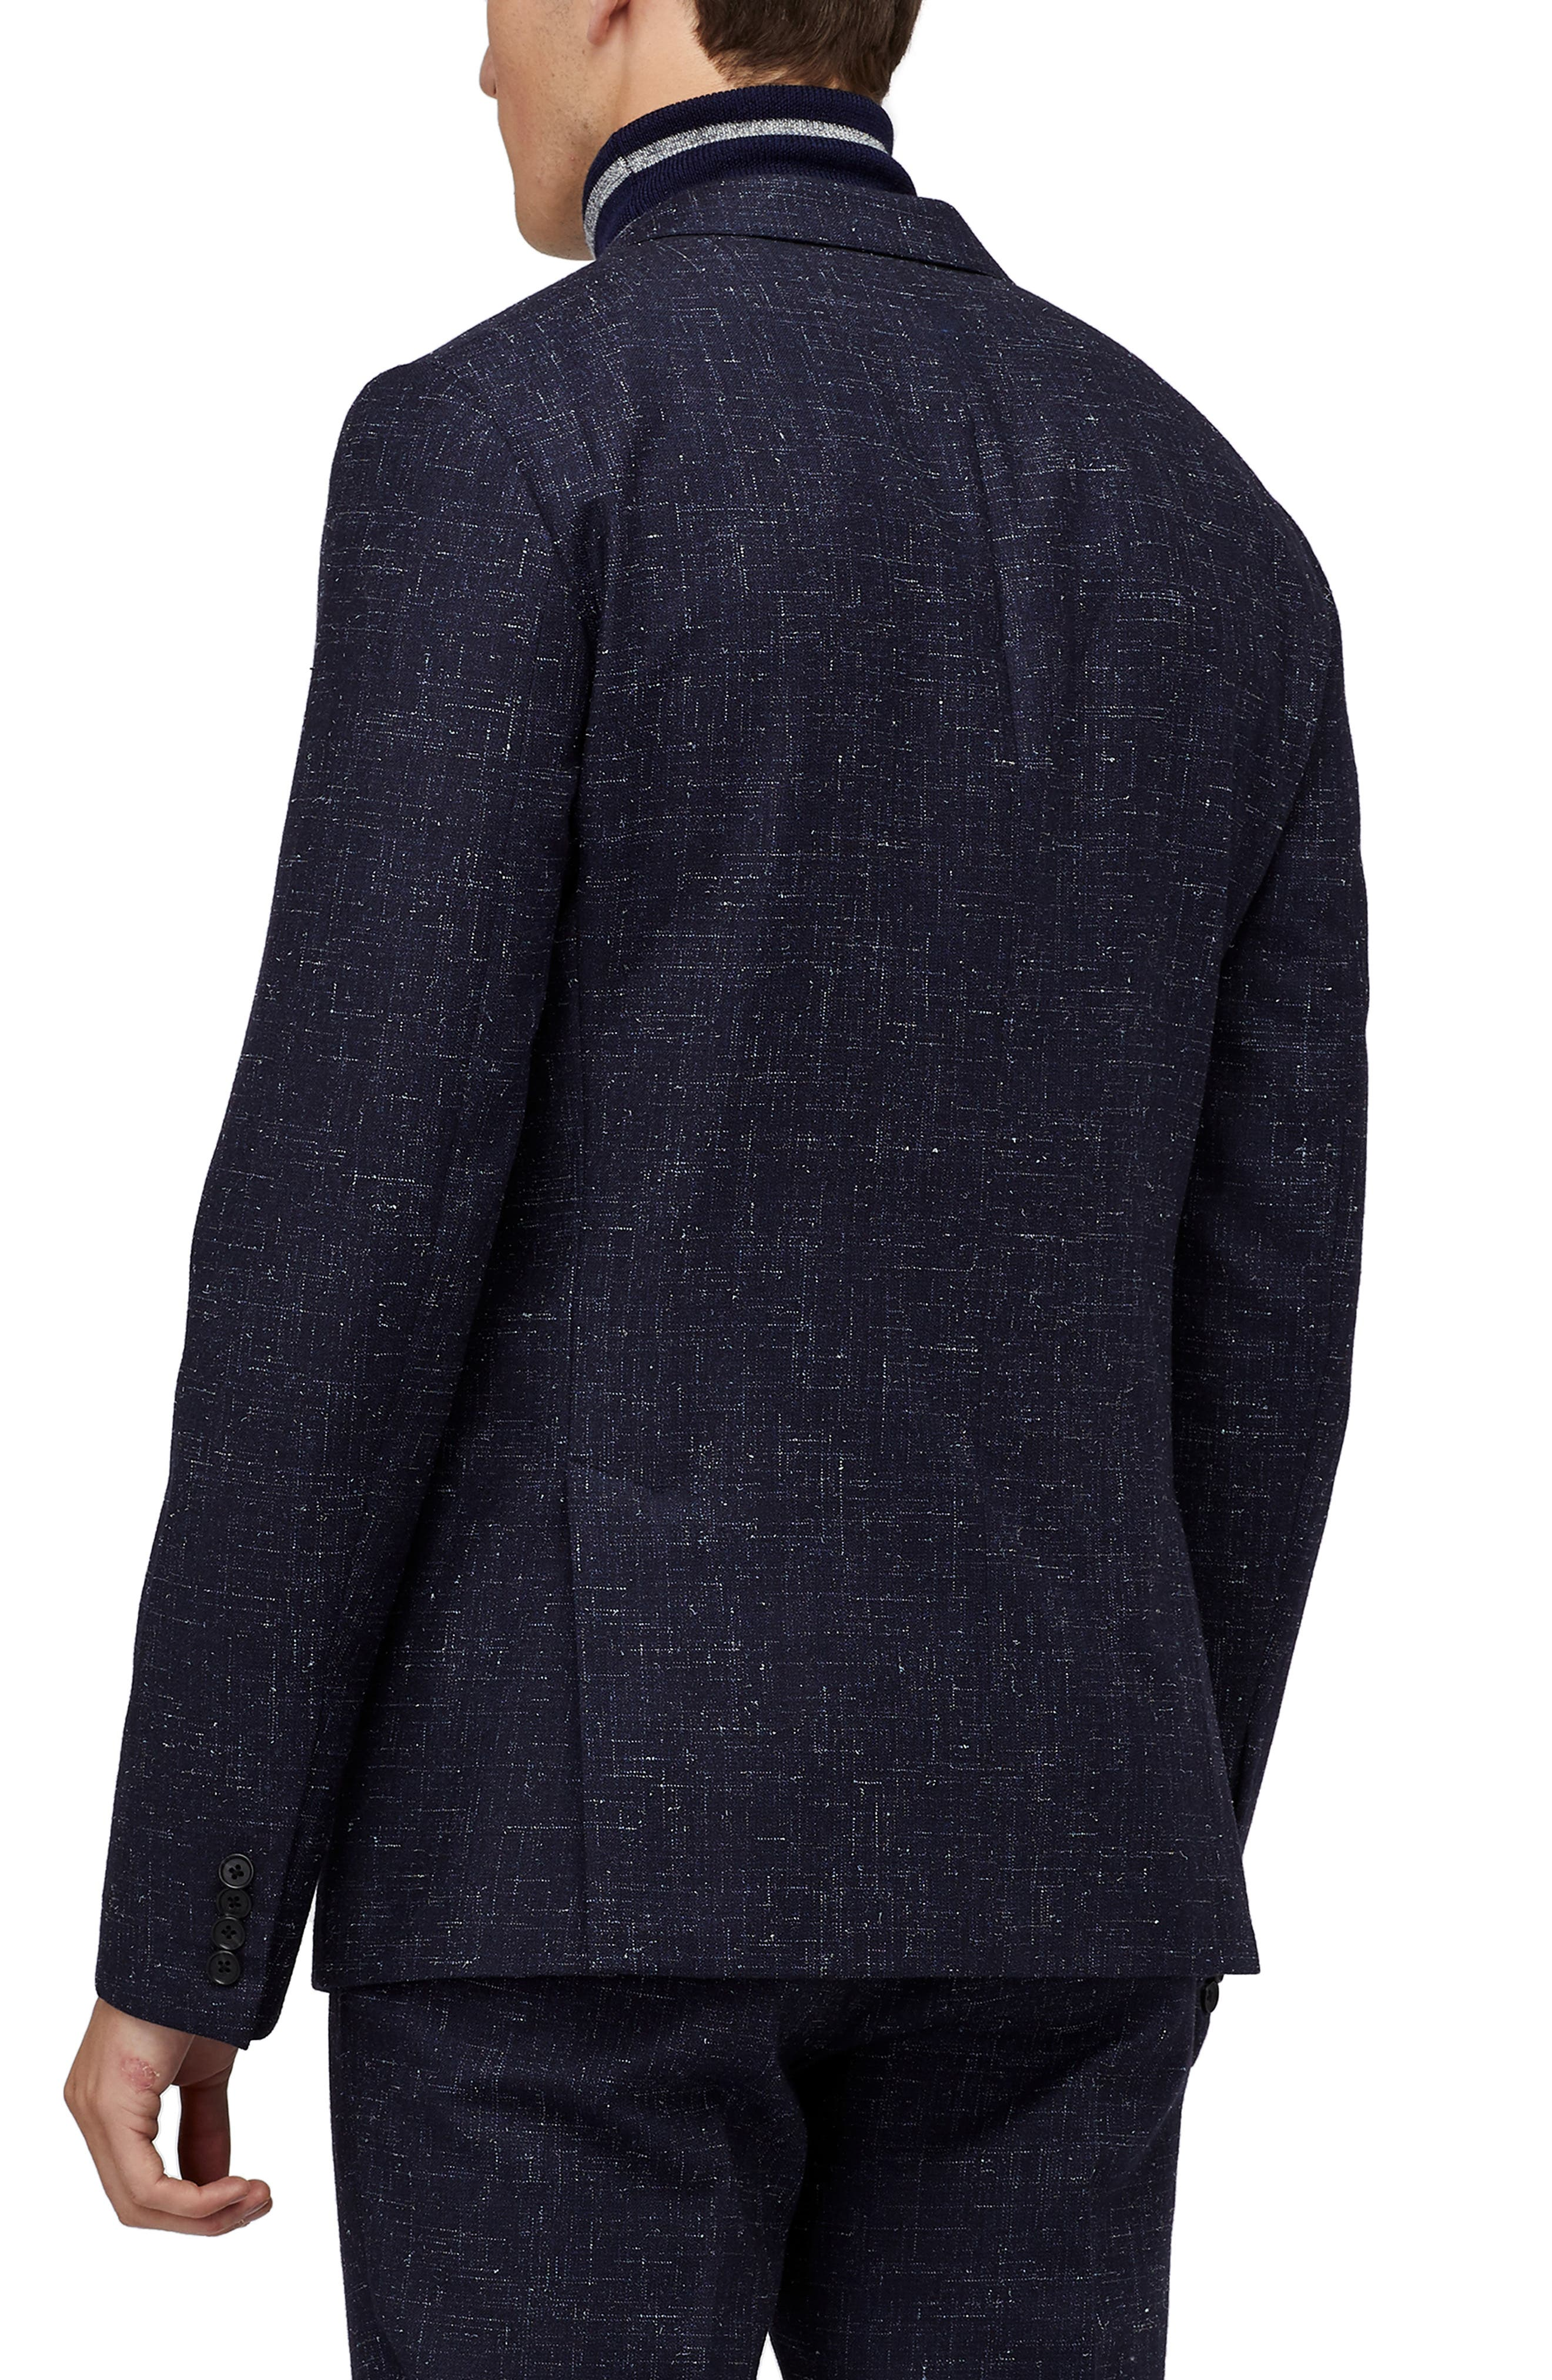 Jetsetter Crosshatch Wool Blend Blazer,                             Alternate thumbnail 2, color,                             NAVY CROSS HATCH